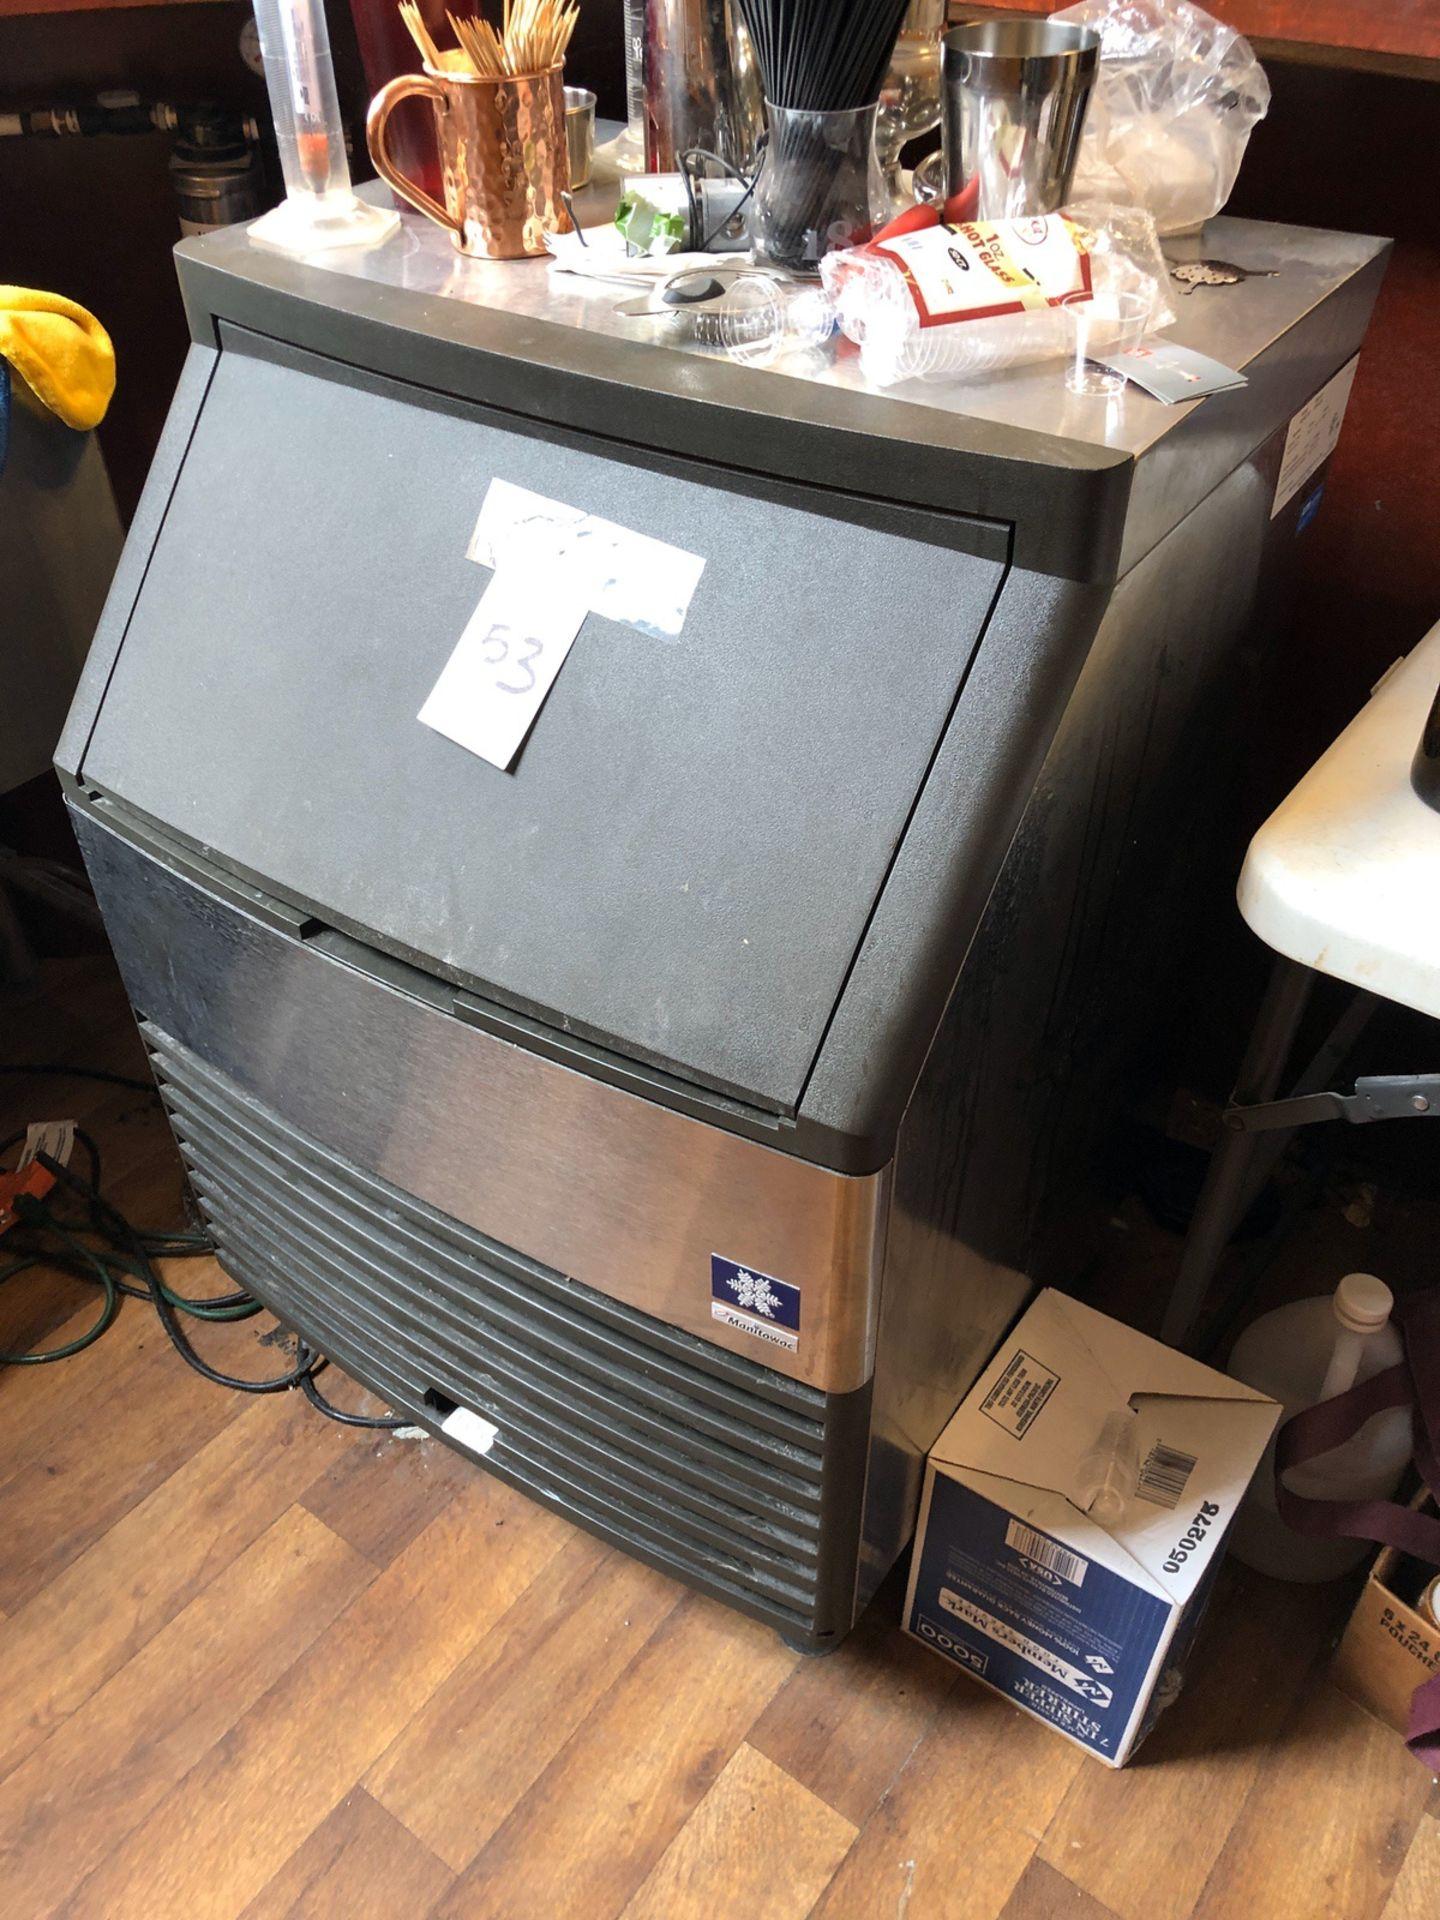 Lot 53 - Manitowac Model QD0132A Ice Maker, R-404A, S/N: 310182101 | Rig Fee: $100